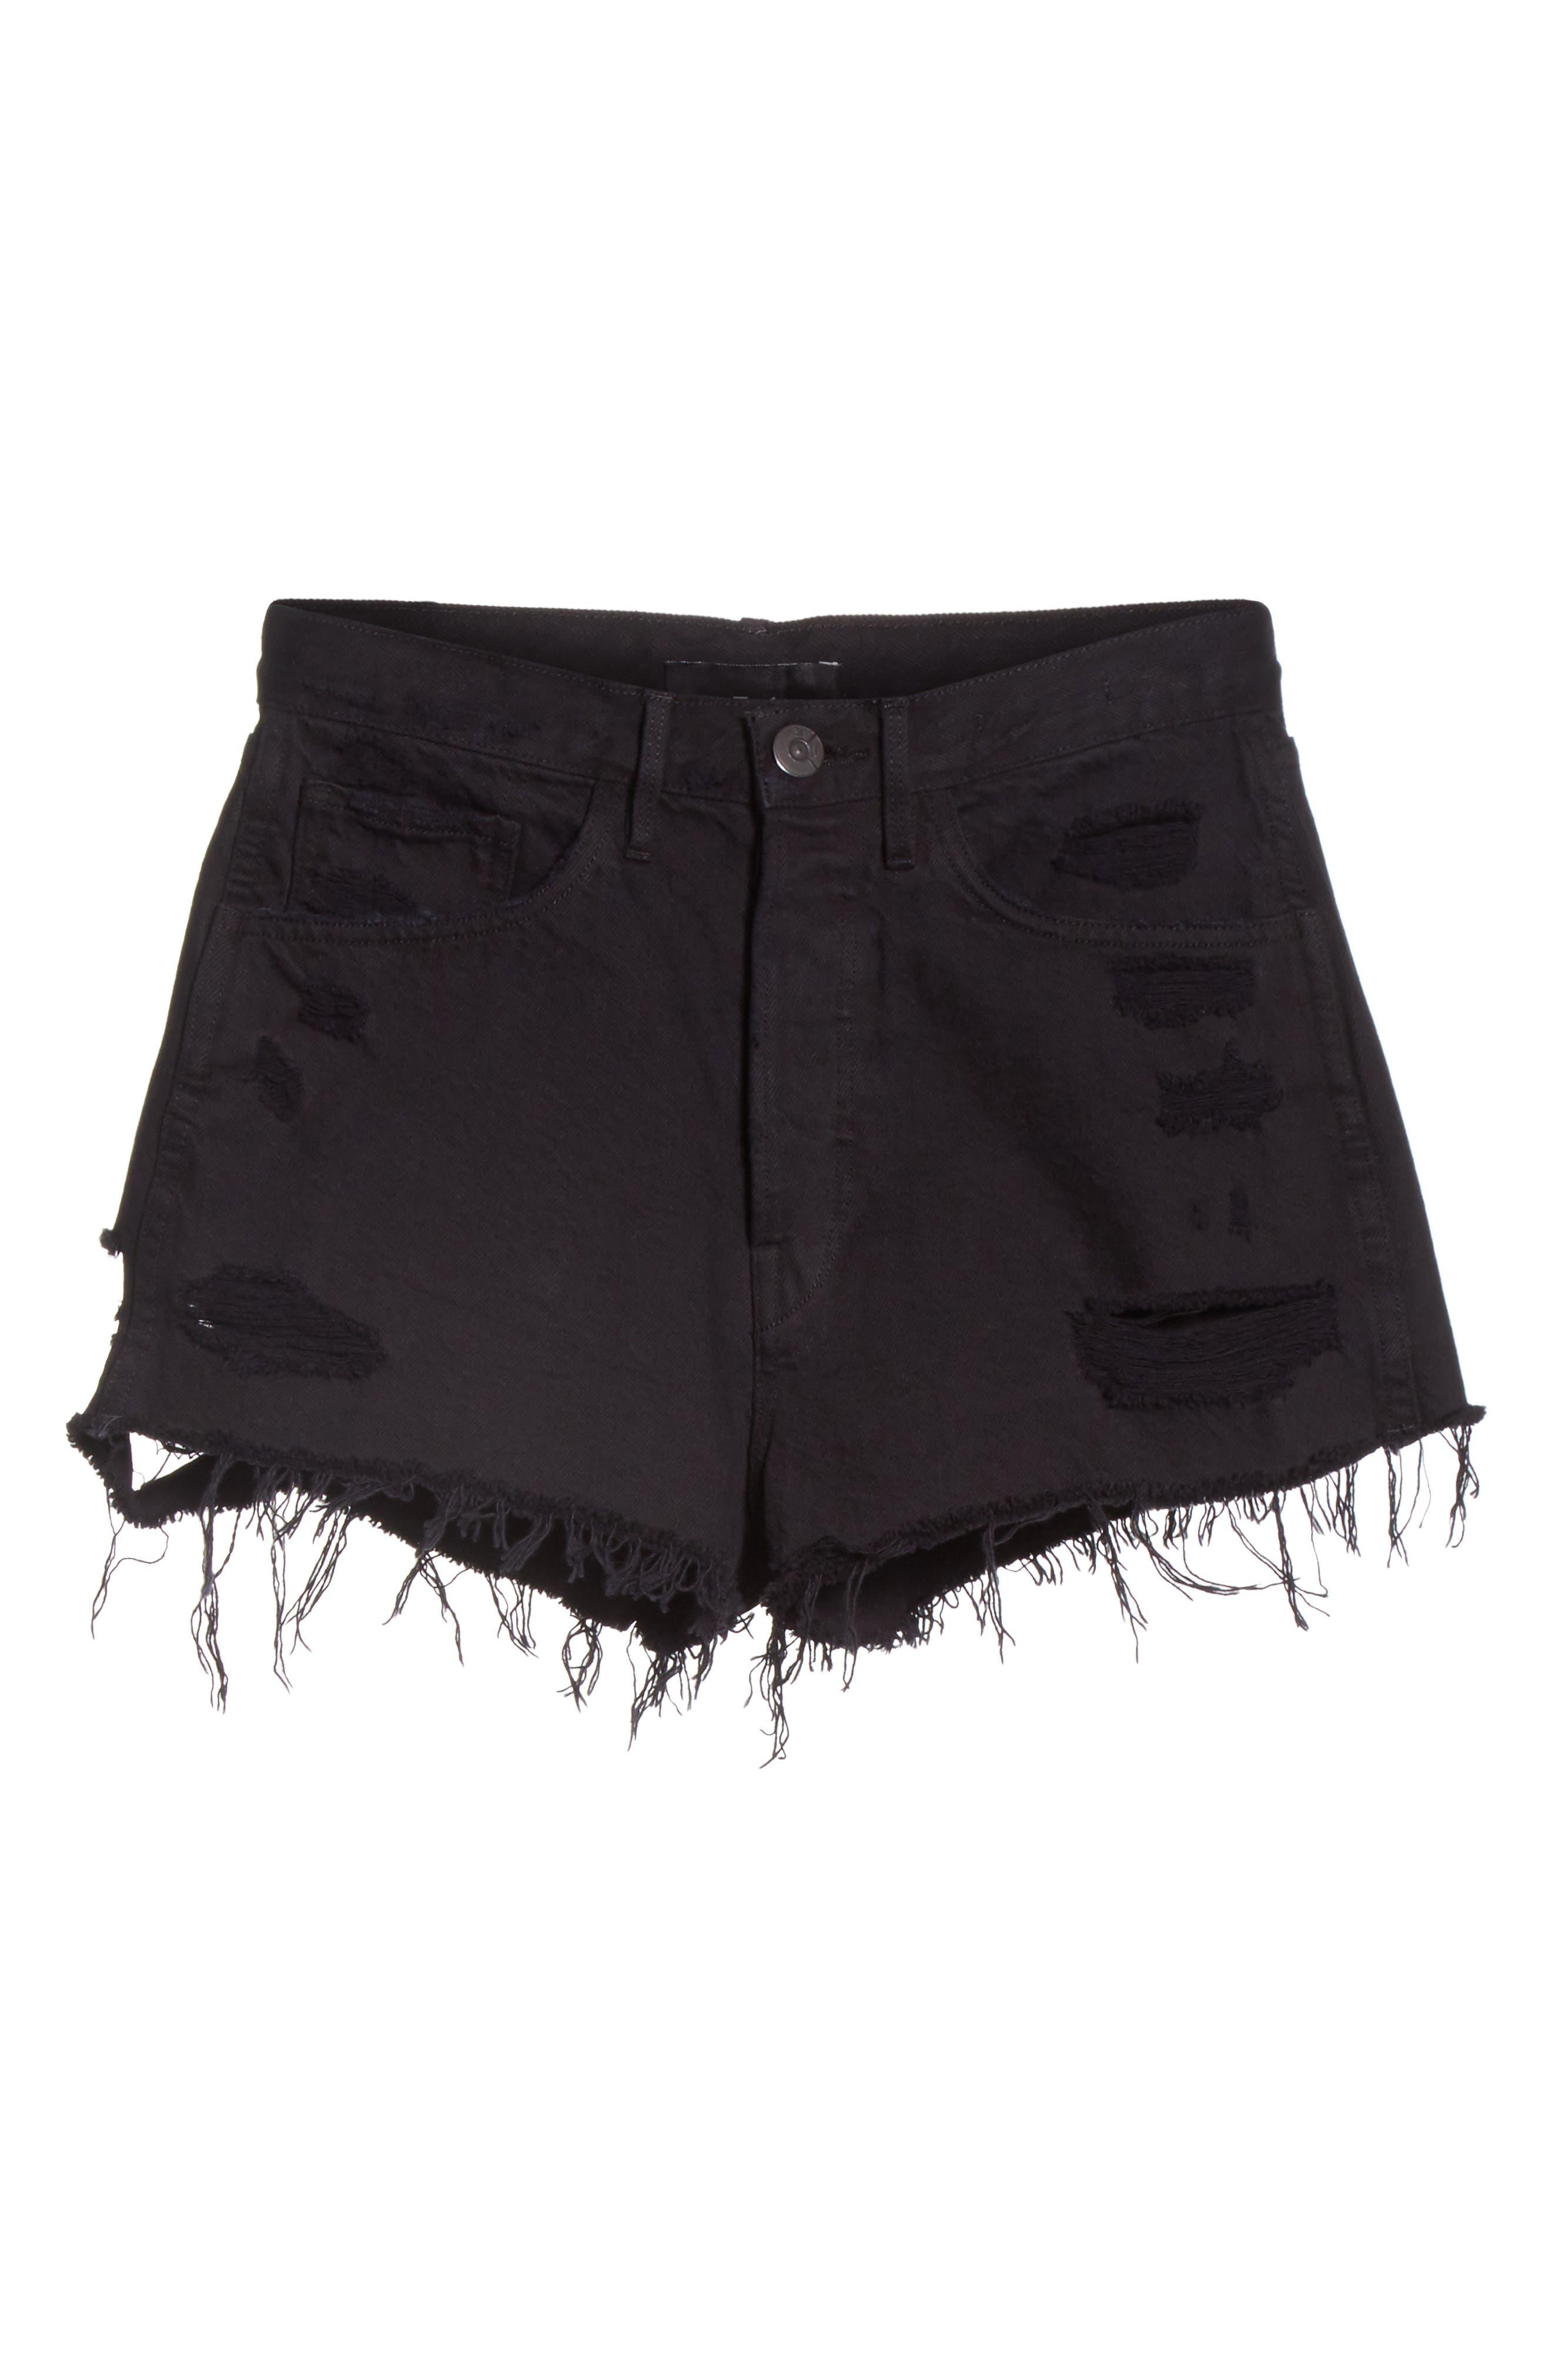 W4 Carter Ripped High Waist Denim Shorts,                             Alternate thumbnail 6, color,                             002